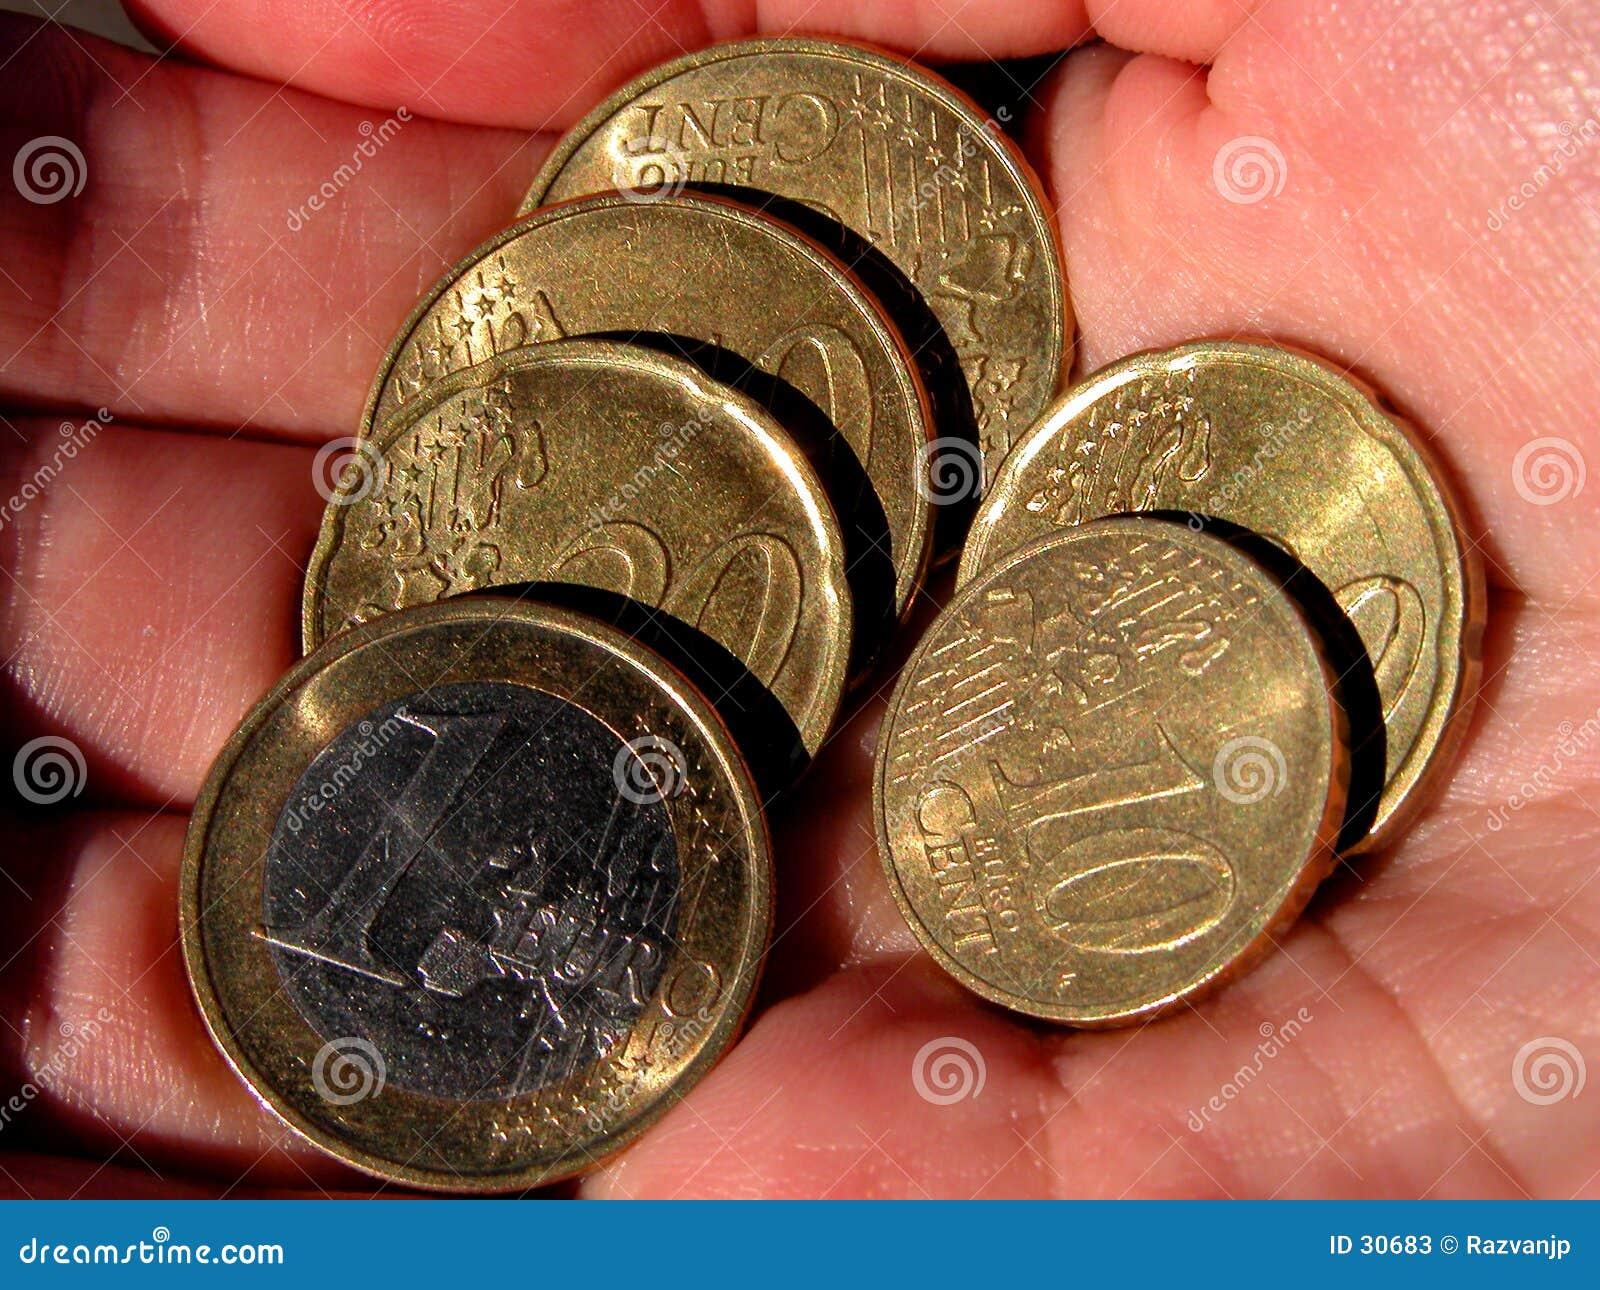 Eurocoins in hand